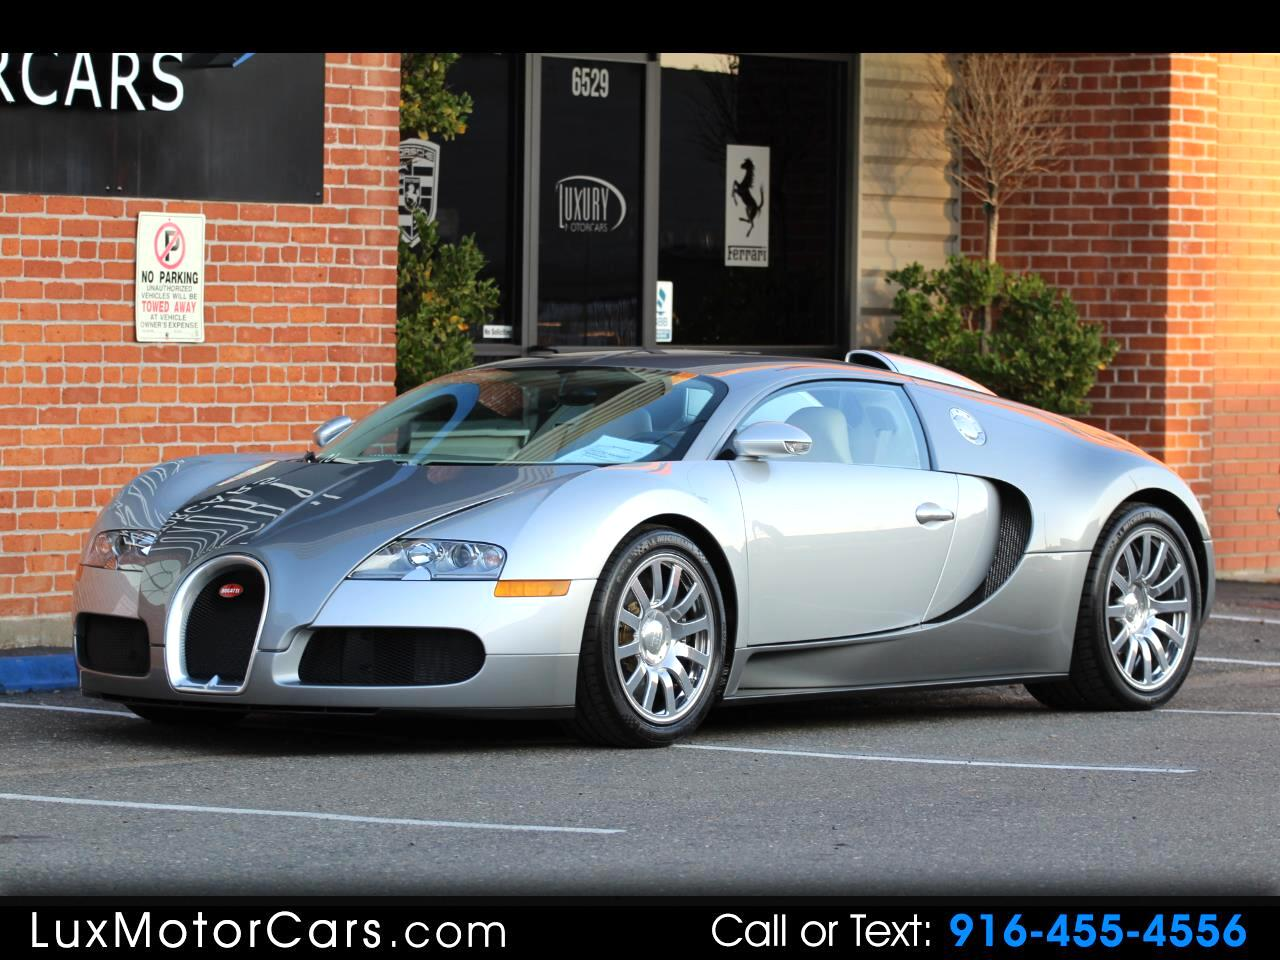 2008 Bugatti Veyron W16.4